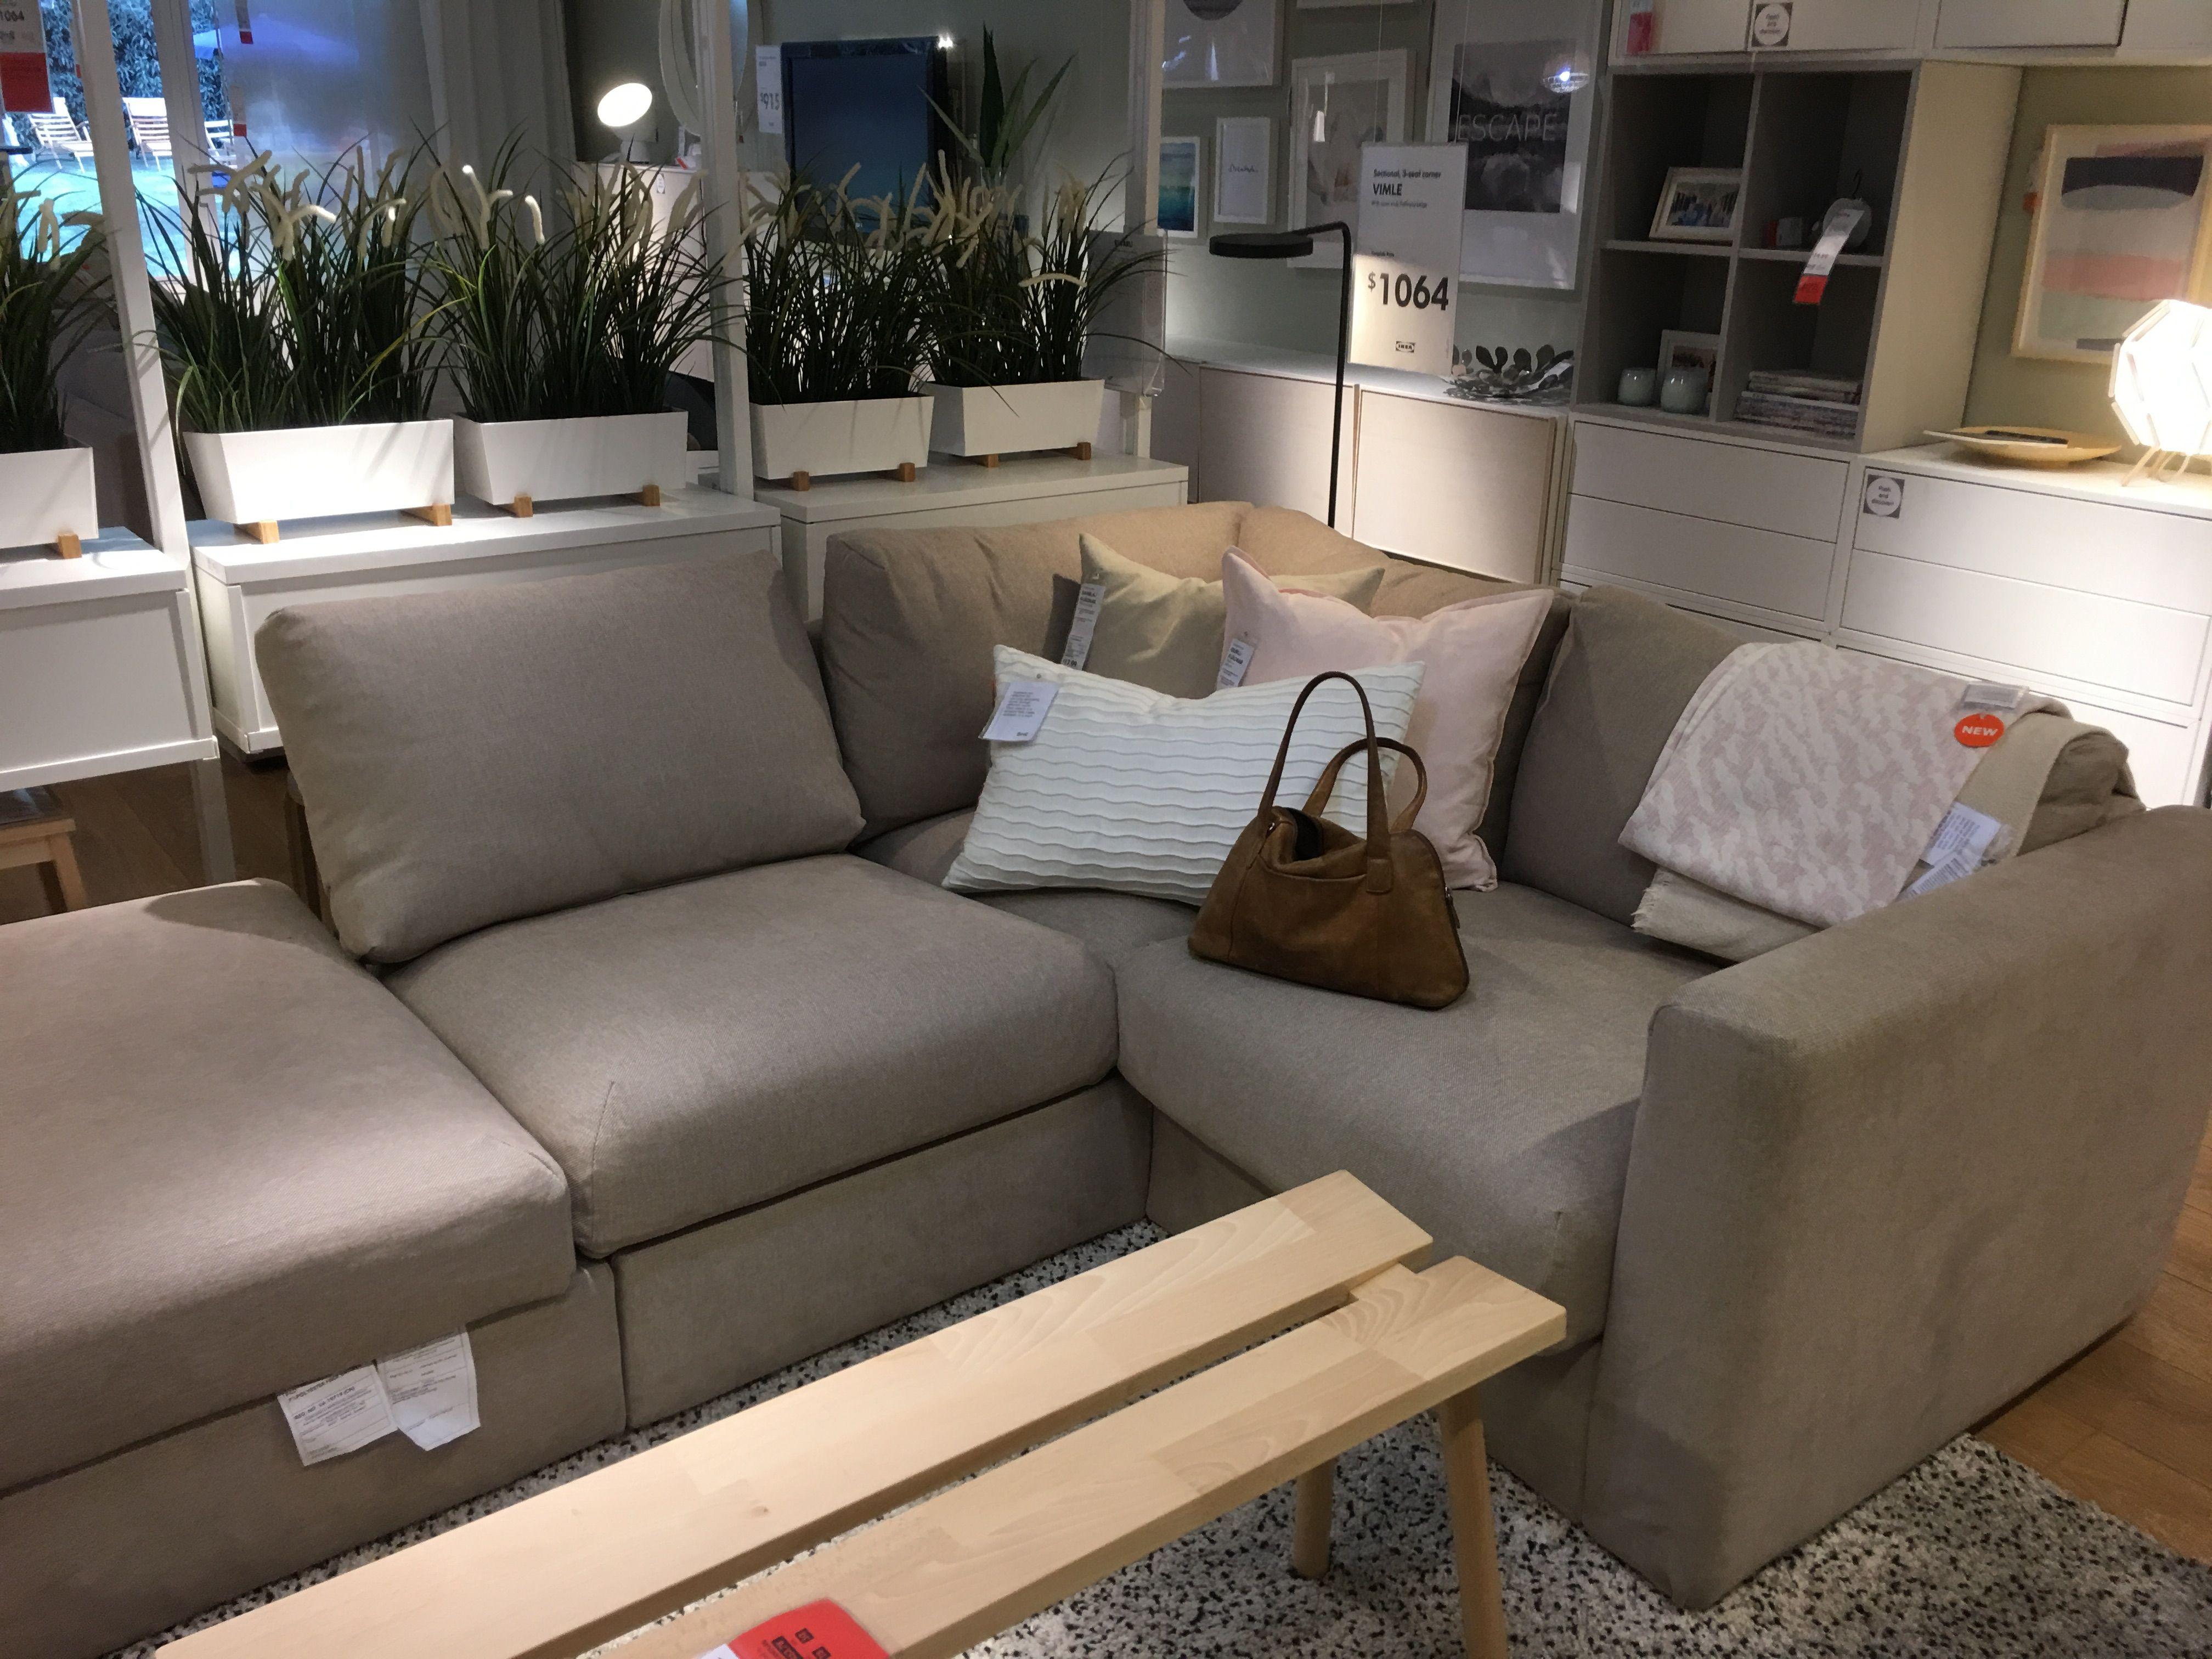 Vimle In Tallmyra Beige More Comfy Than The Grey One Ikea Sofa Living Room Sofa Ikea Shopping